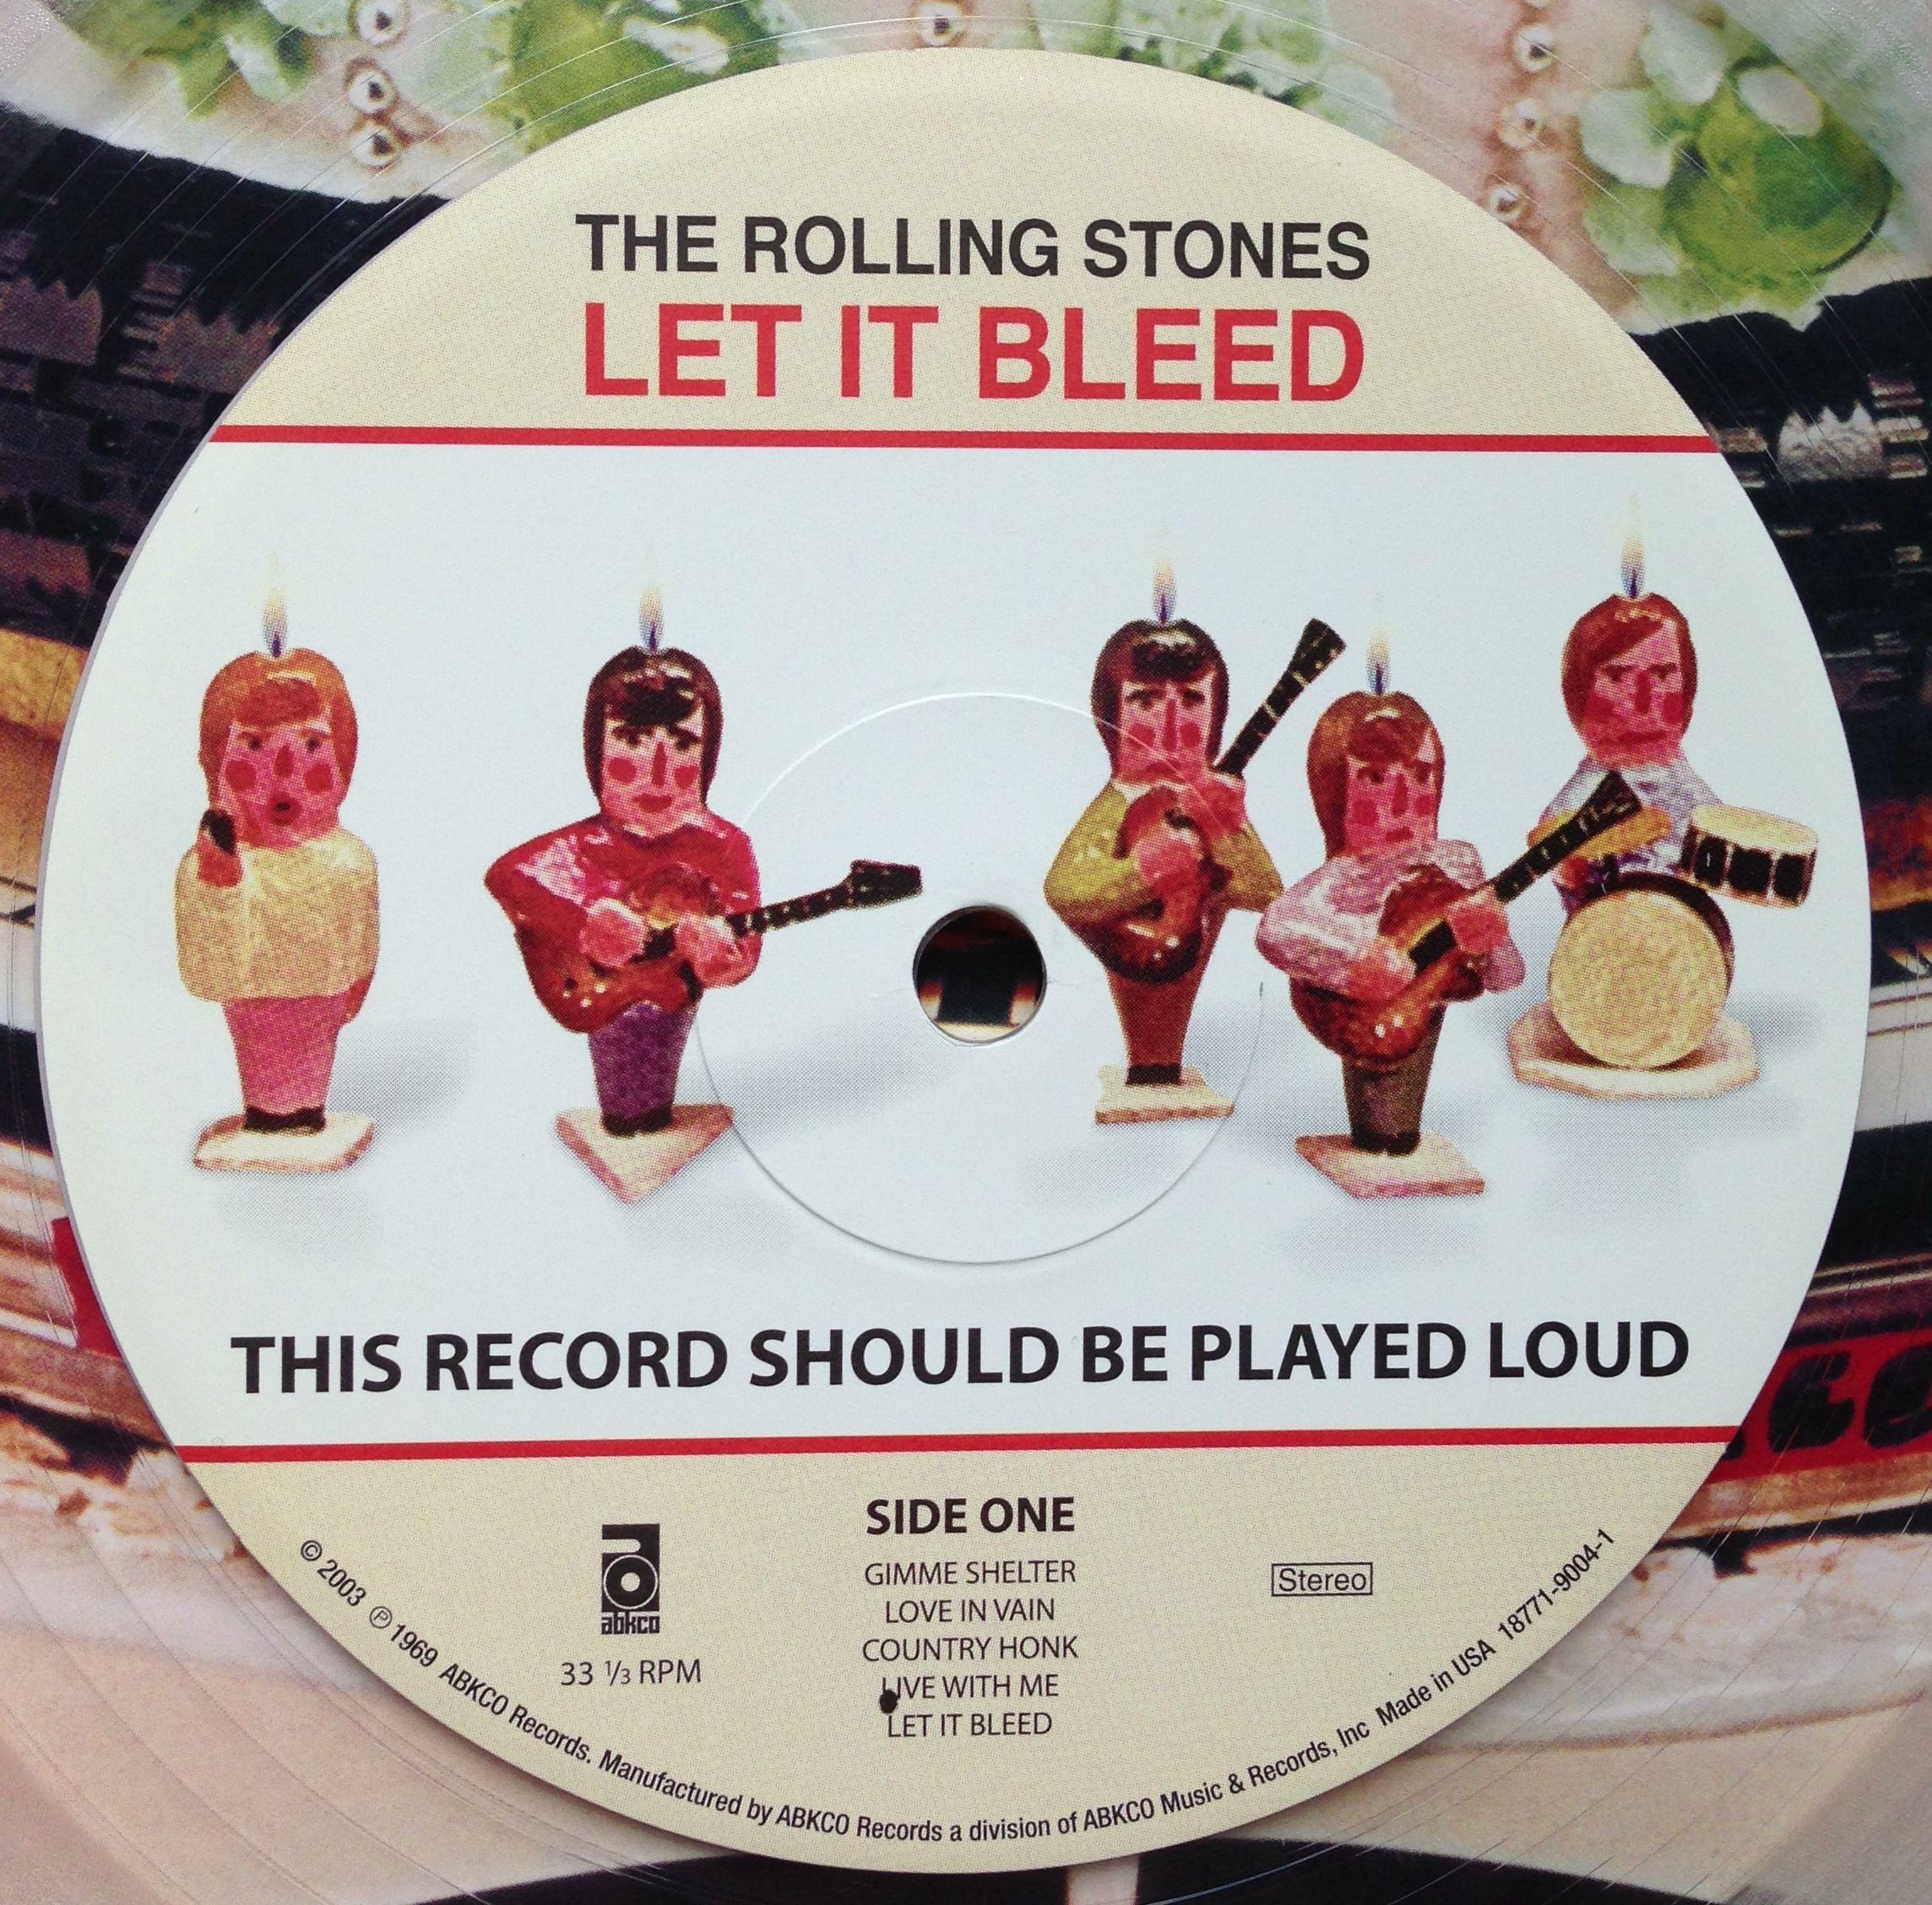 The rolling stones let it bleed play it loud music mostly the rolling stones let it bleed play it loud hexwebz Choice Image